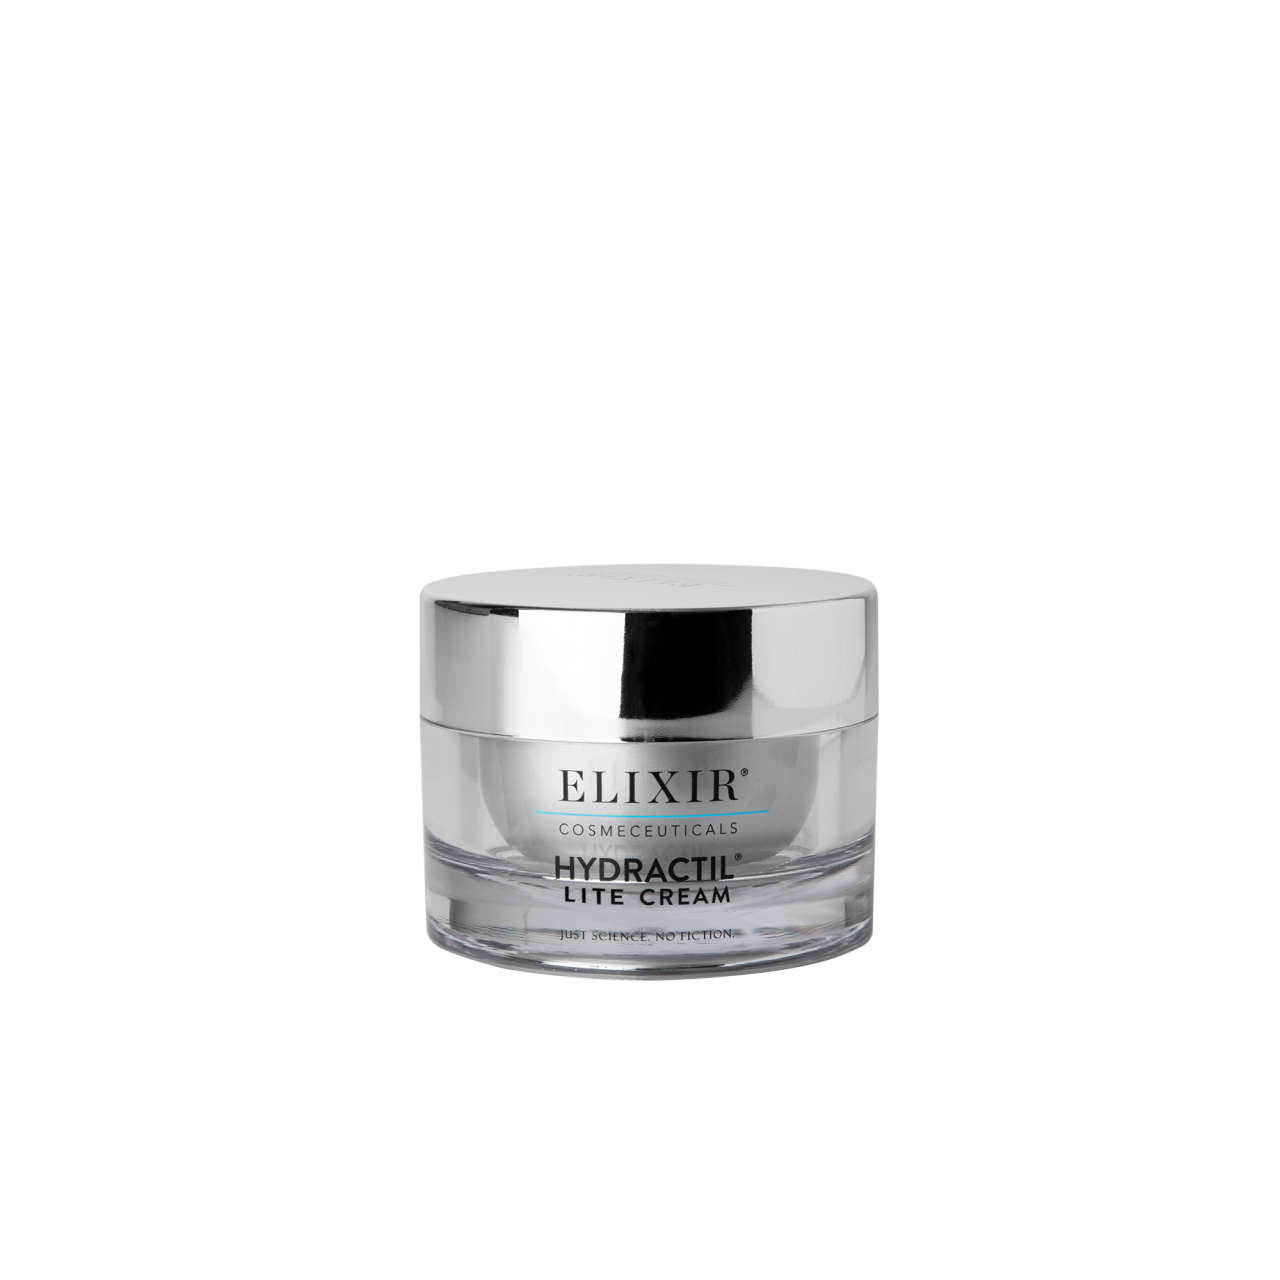 Hydractil Lite Cream